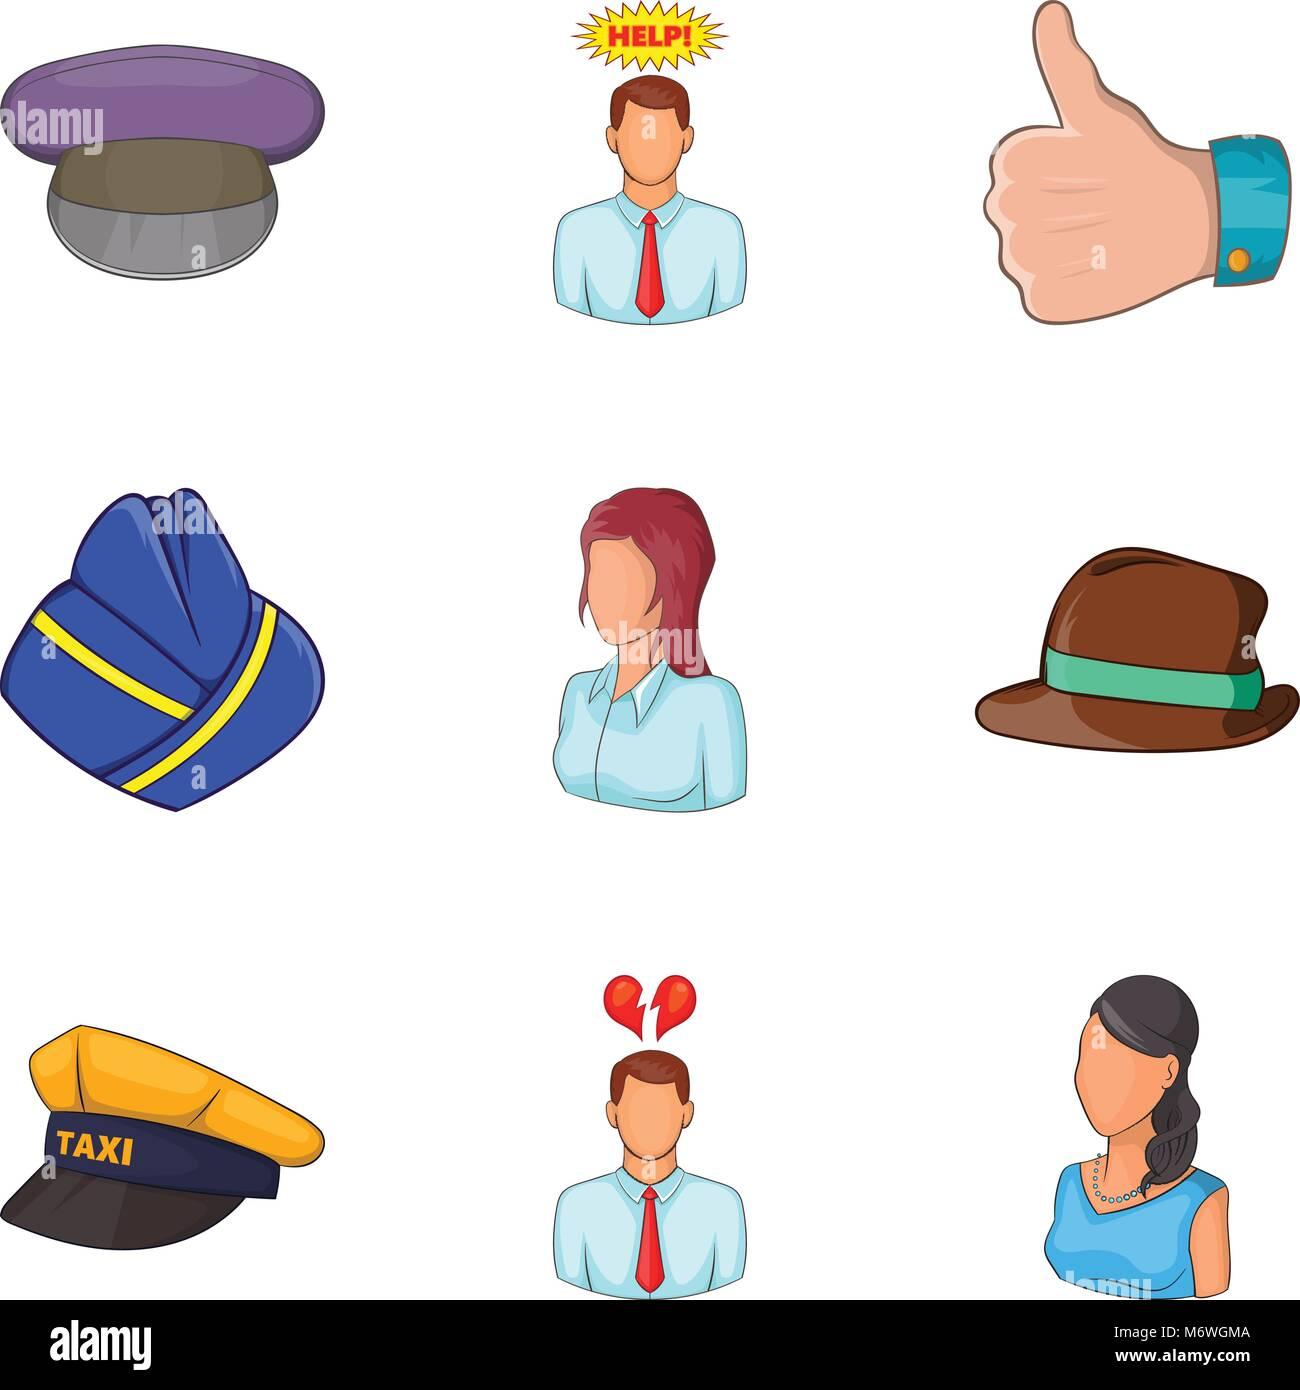 Description of personnel icons set, cartoon style - Stock Image